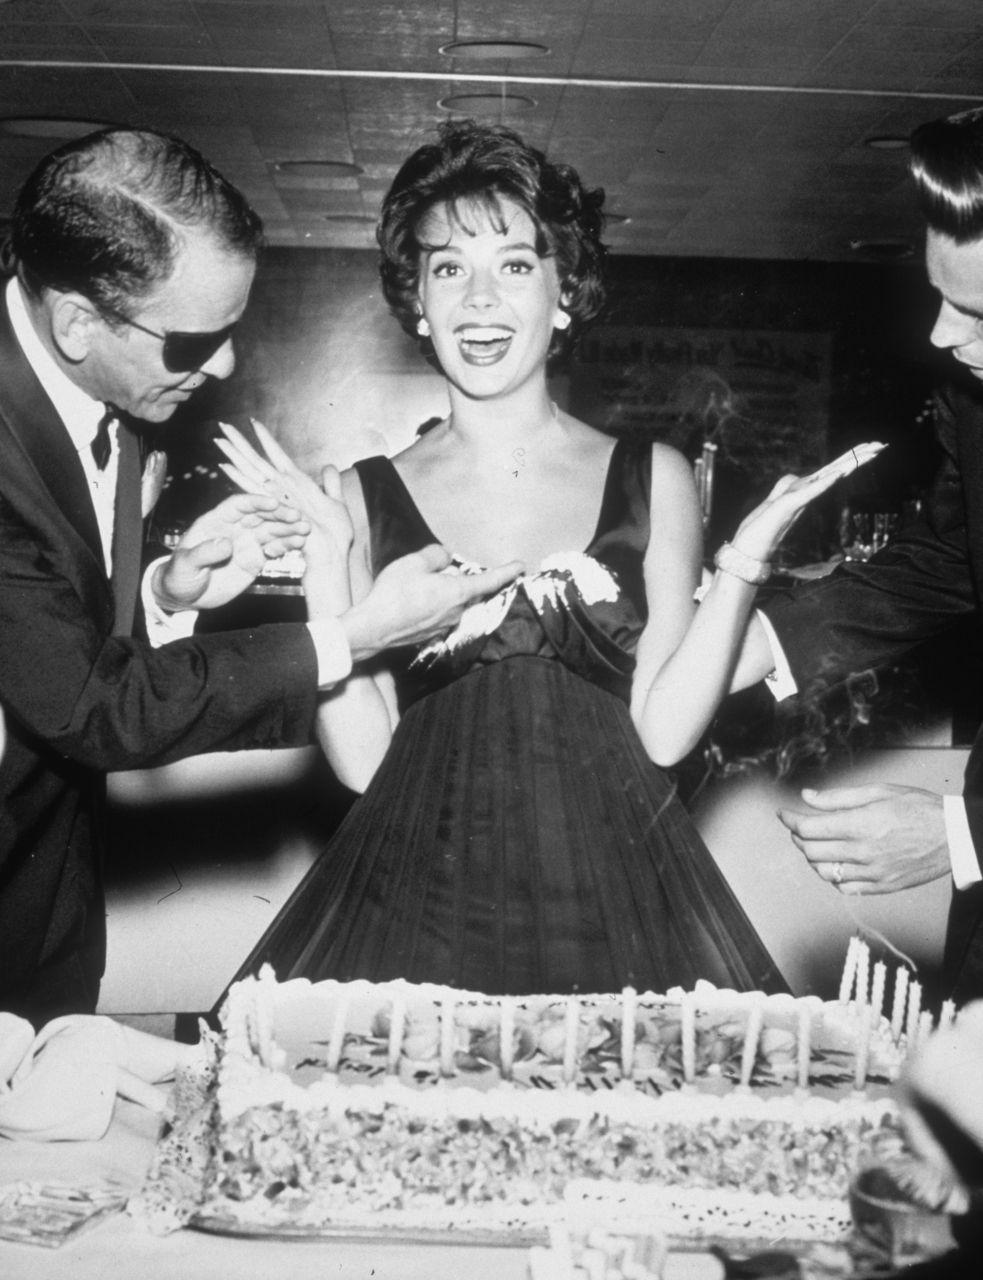 Frank Sinatra Smears Birthday Cake On Natalie Woods Dress At A